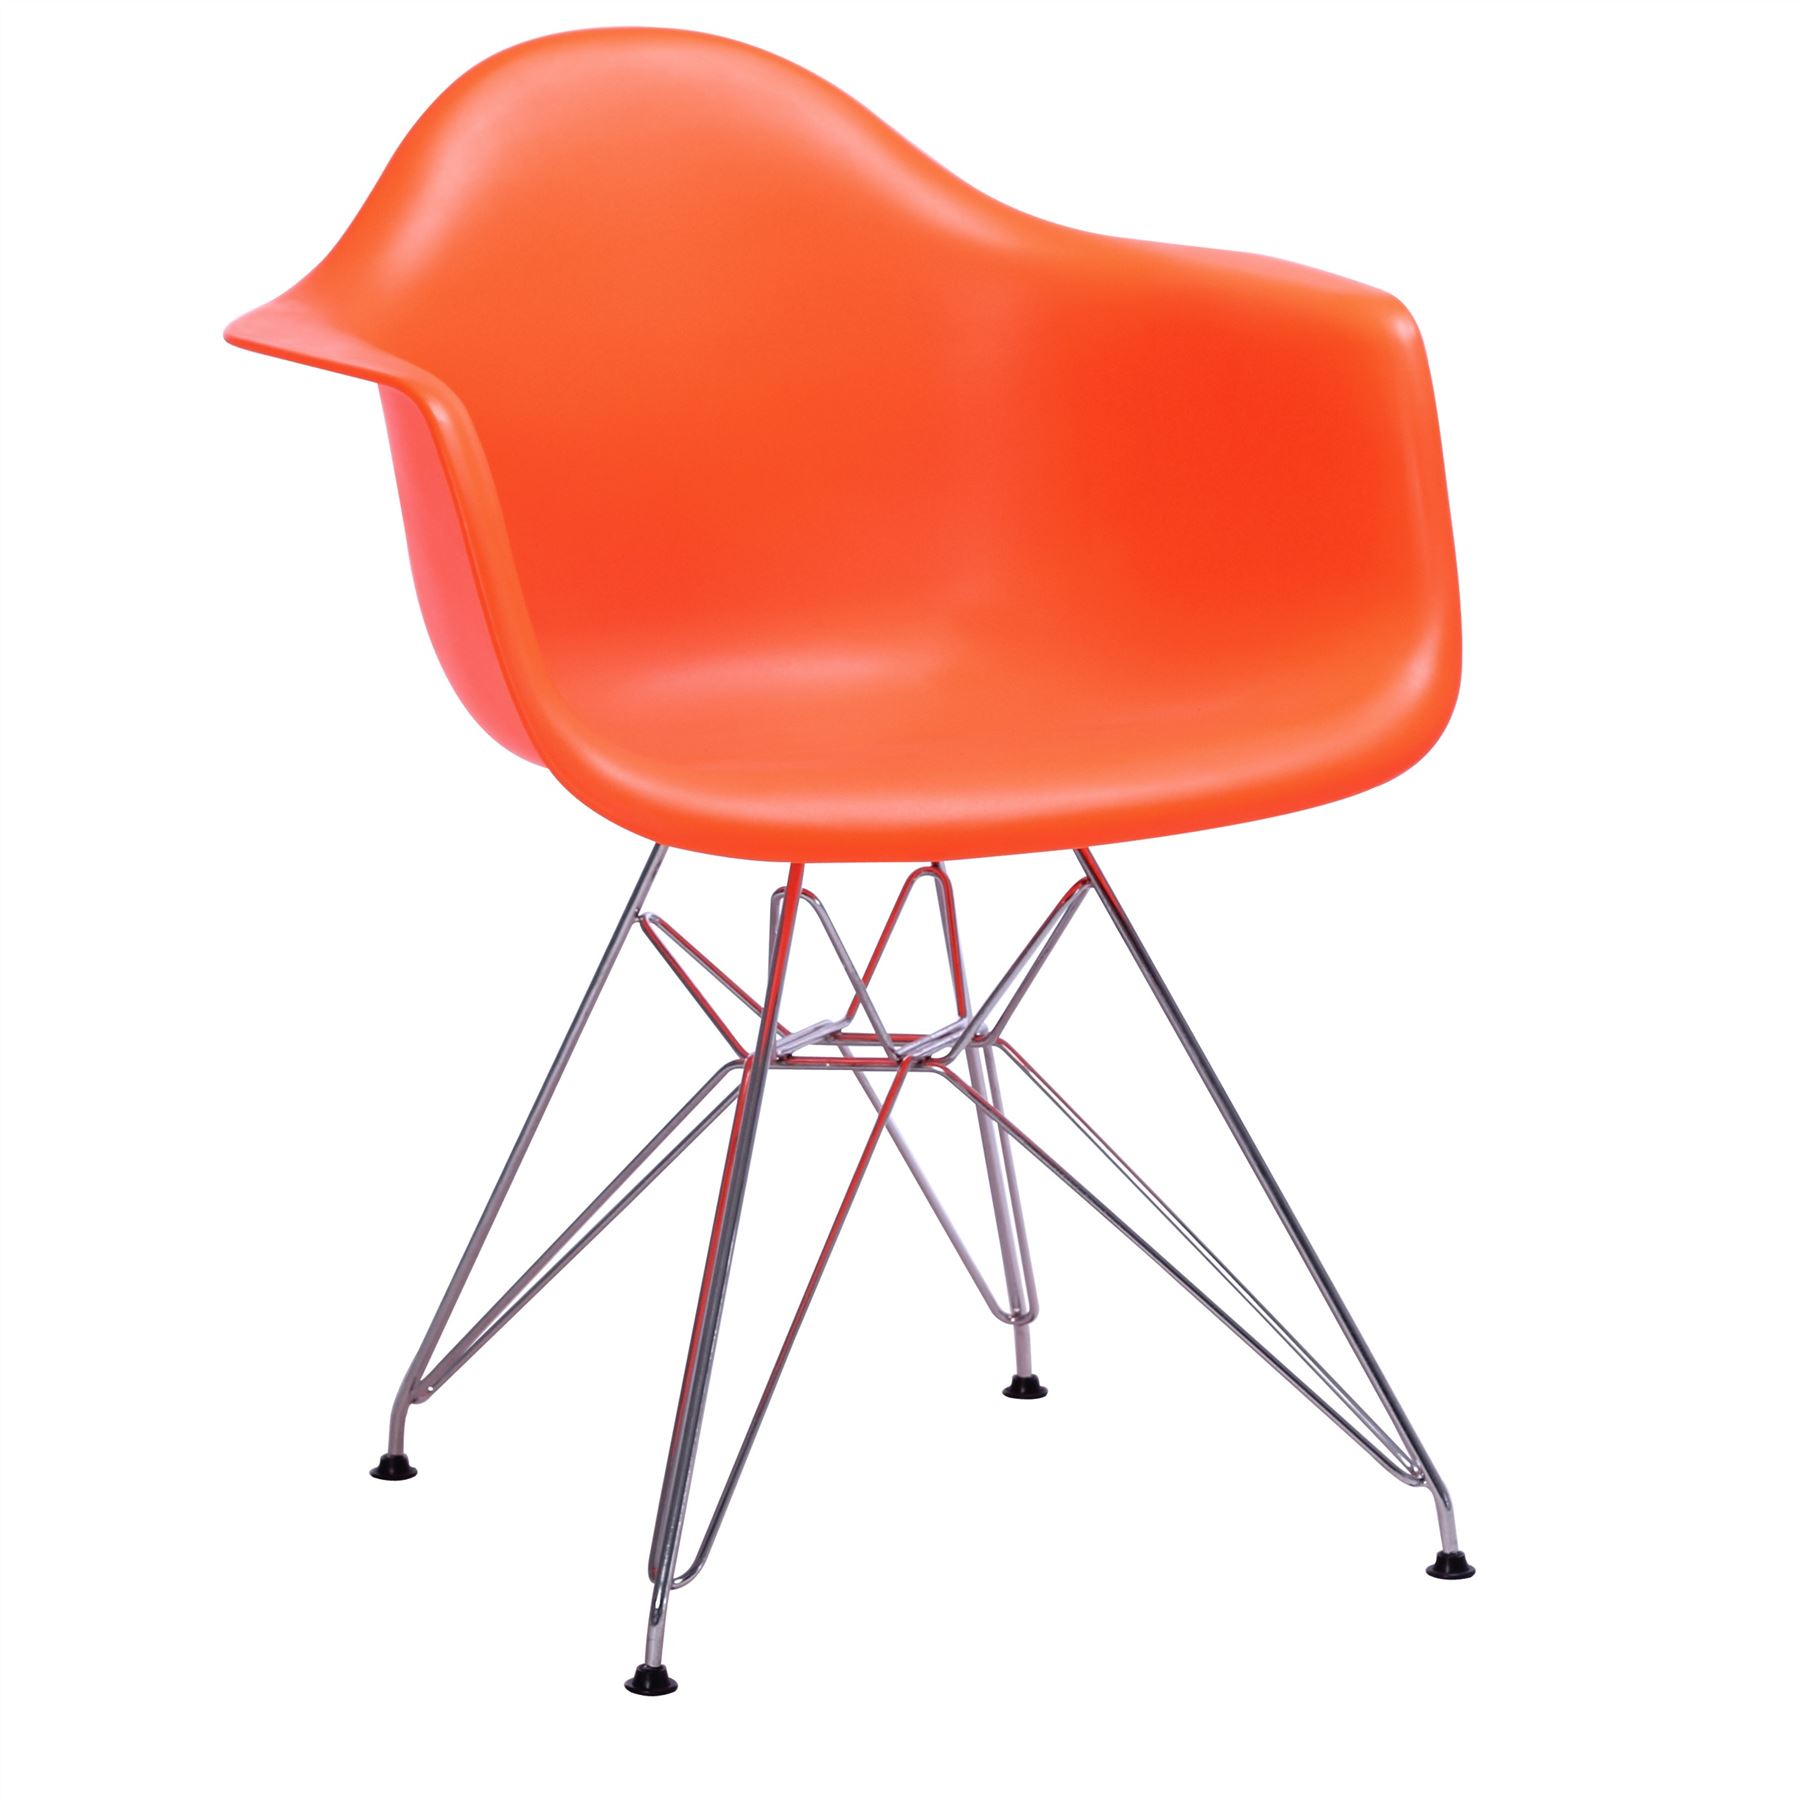 Eames Inspired Eiffel Retro Plastic